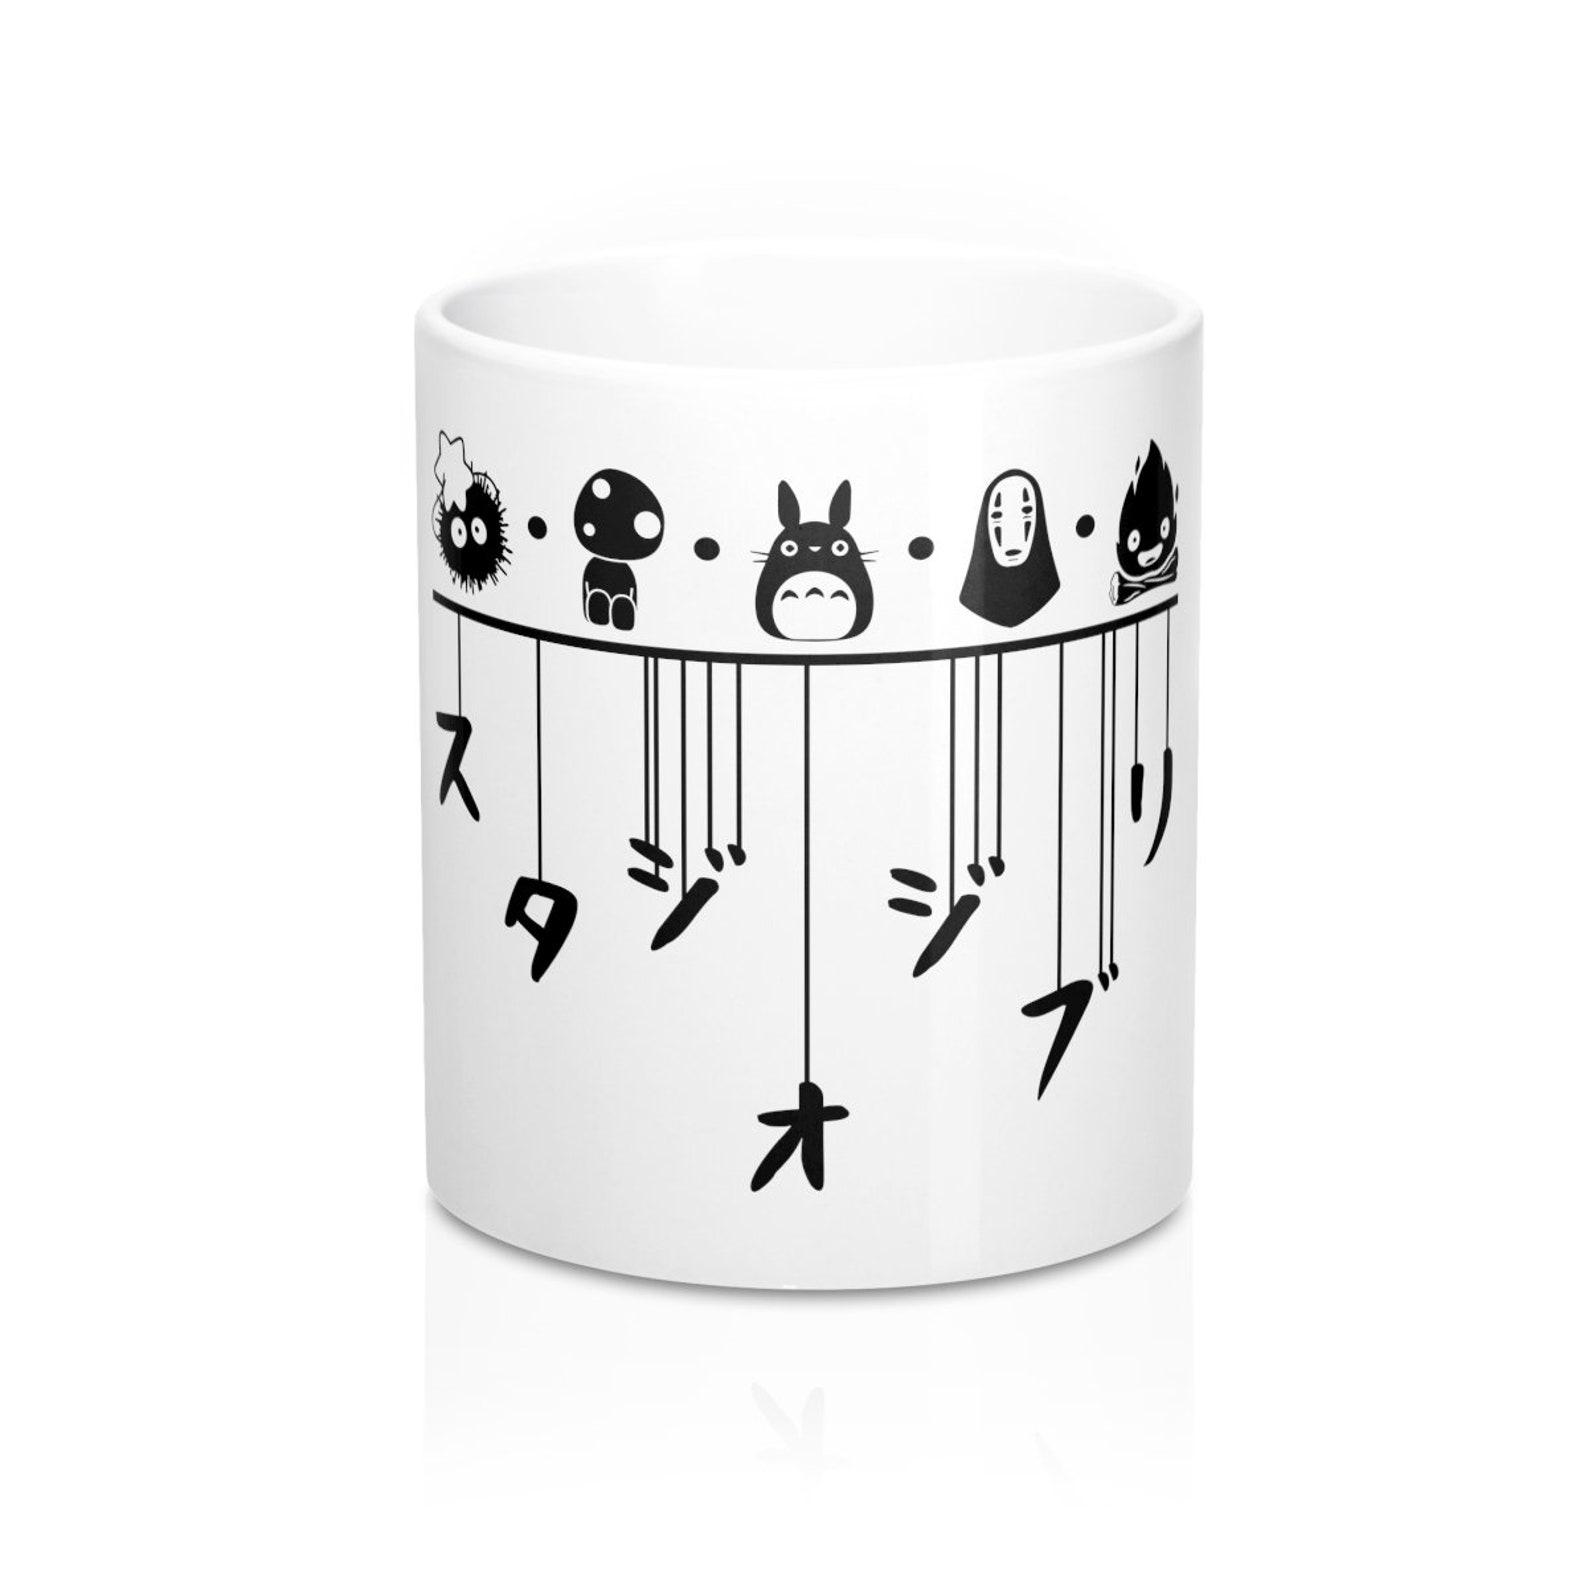 Studio Ghibli Mug, Anime Gift, Ghibli Gift, Susuwatari, Soot Sprites, Kodama, Totoro, No-Face, Calcifer, Anime Mug, Hayao Miyazaki, Mug 11oz